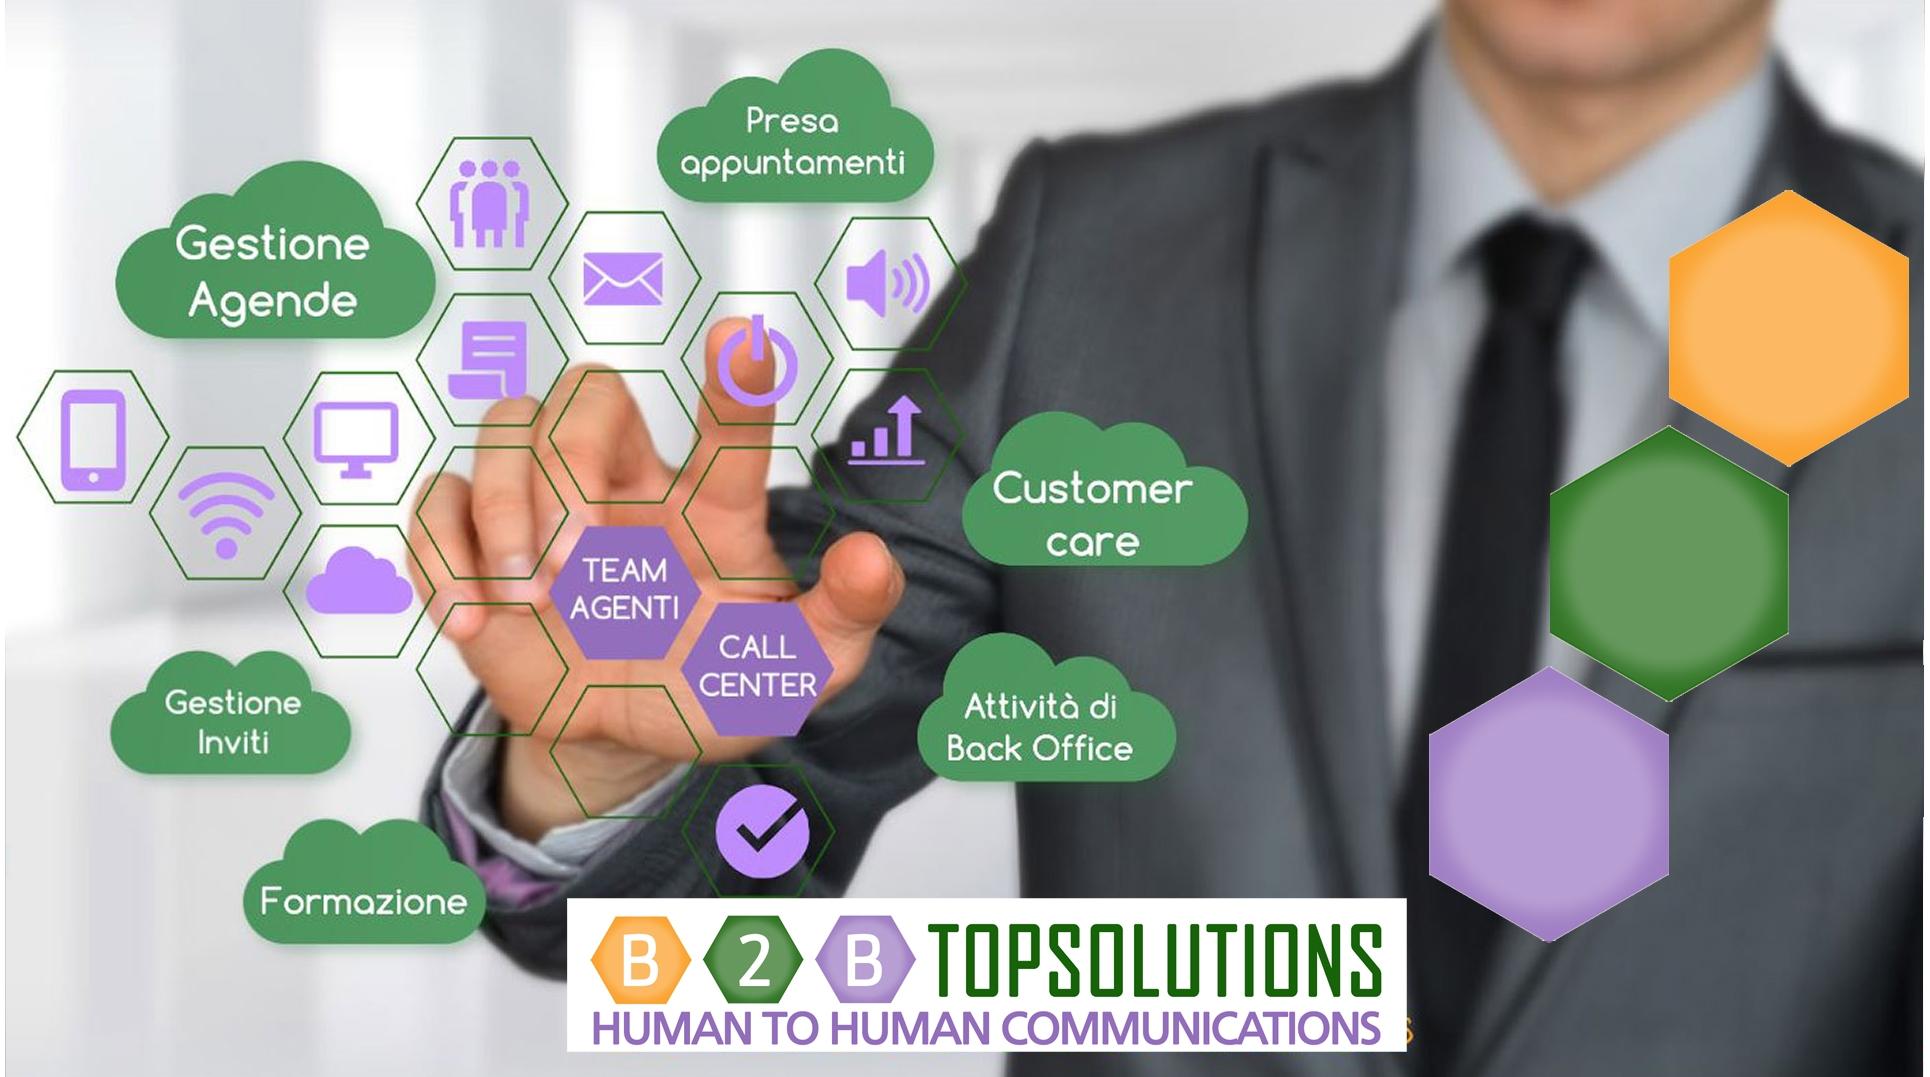 servizi b2b telemarketing presa appuntamenti listino prezzi top solutions torino call center telefonia energia